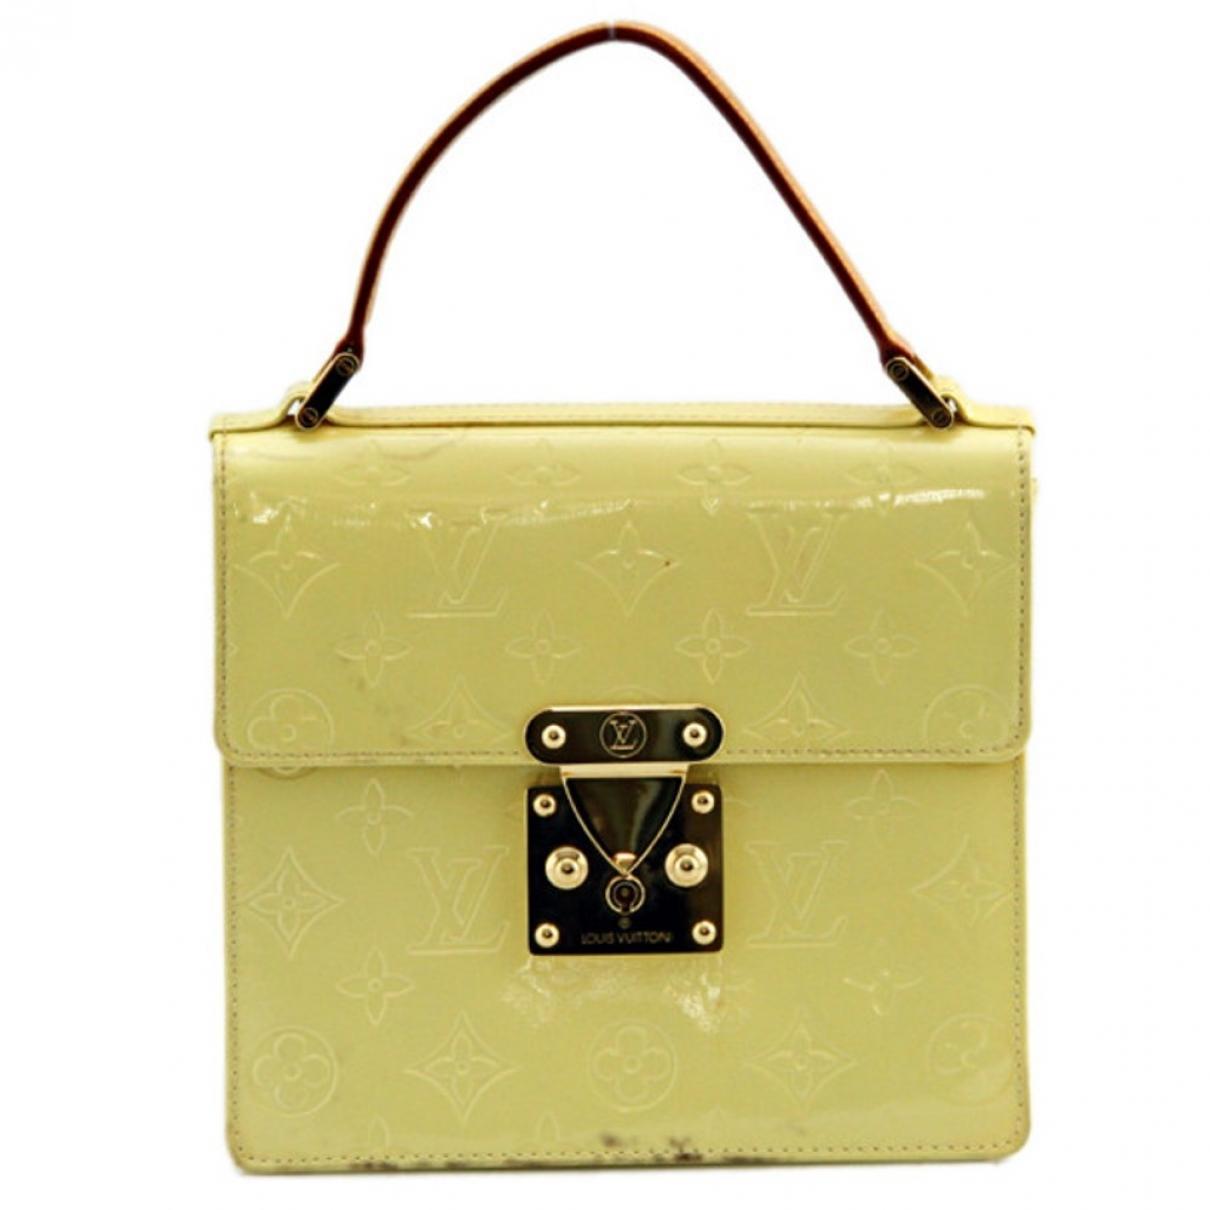 Louis Vuitton Spring street Yellow Leather handbag for Women \N